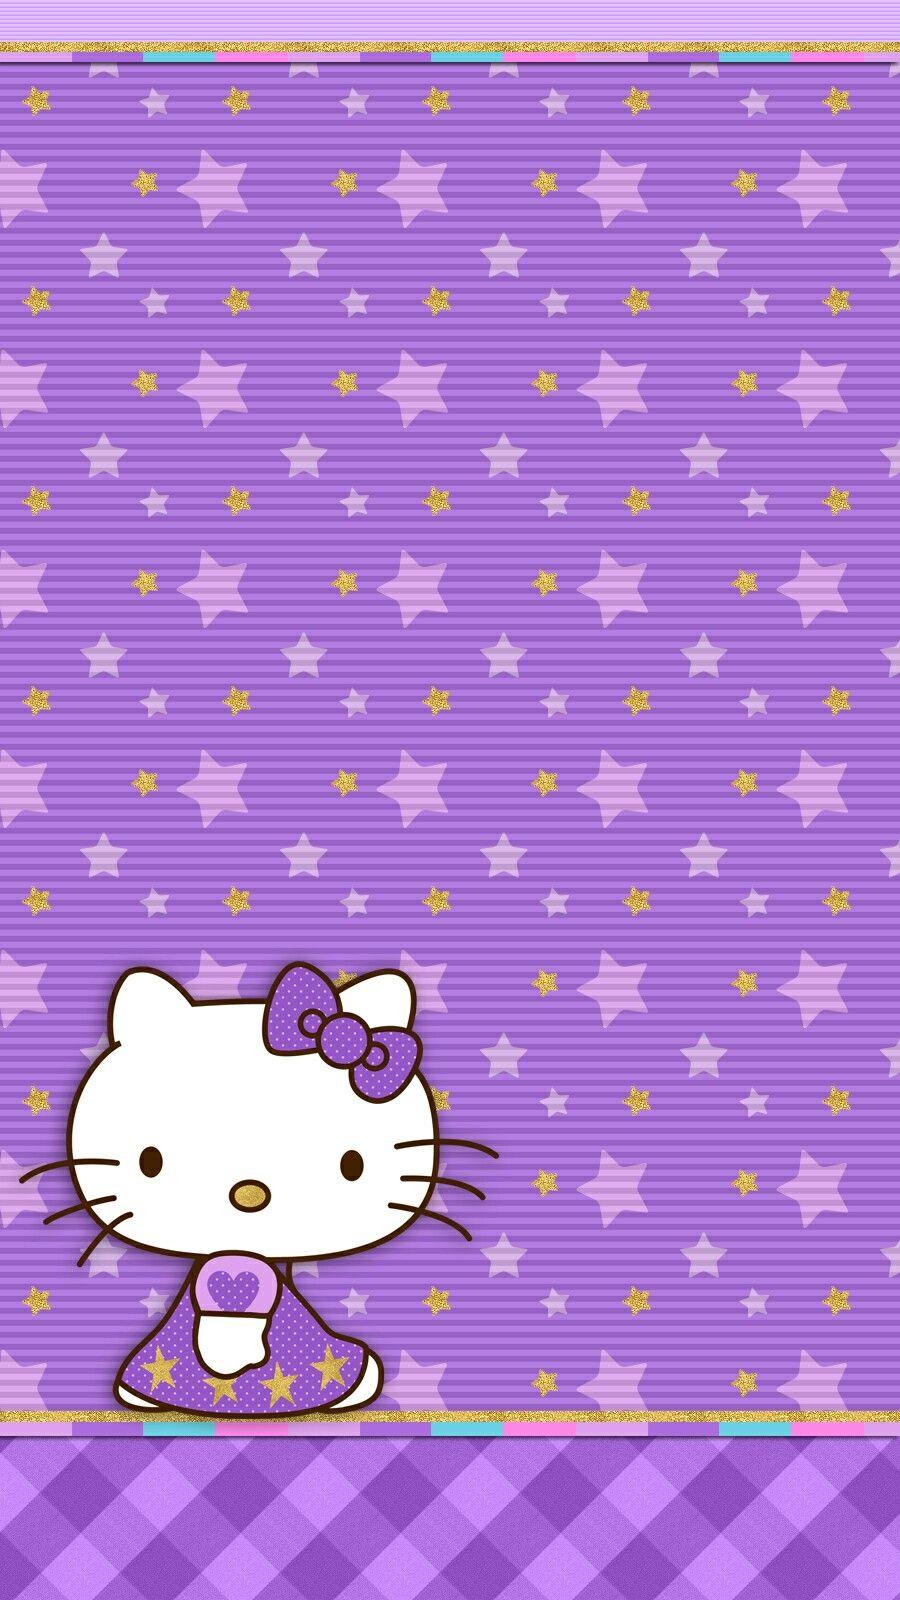 violet twilight hello kitty Hello kitty backgrounds